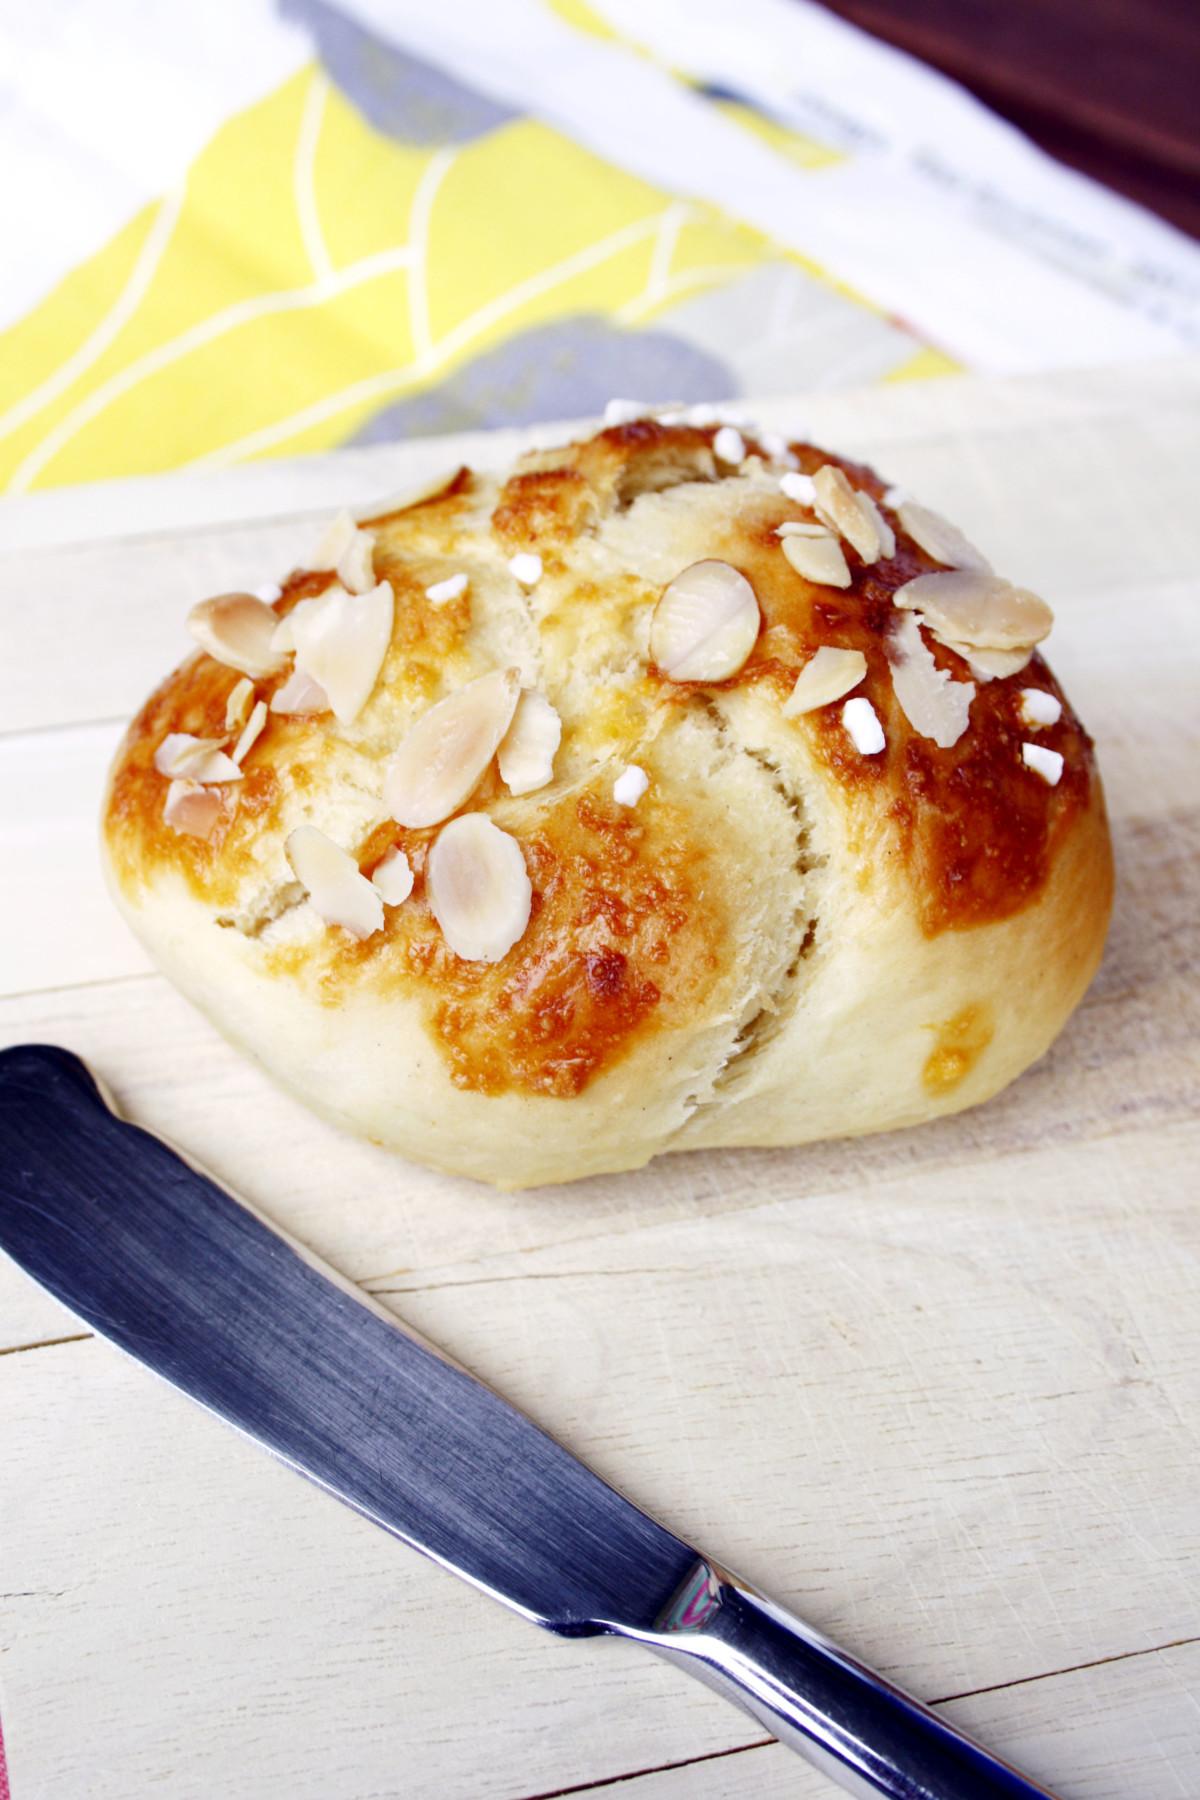 Hefeknoten für das perfekte Frühstück // Sweet breakfast buns by https://babyrockmyday.com/hefeknoten-fruehstueck/